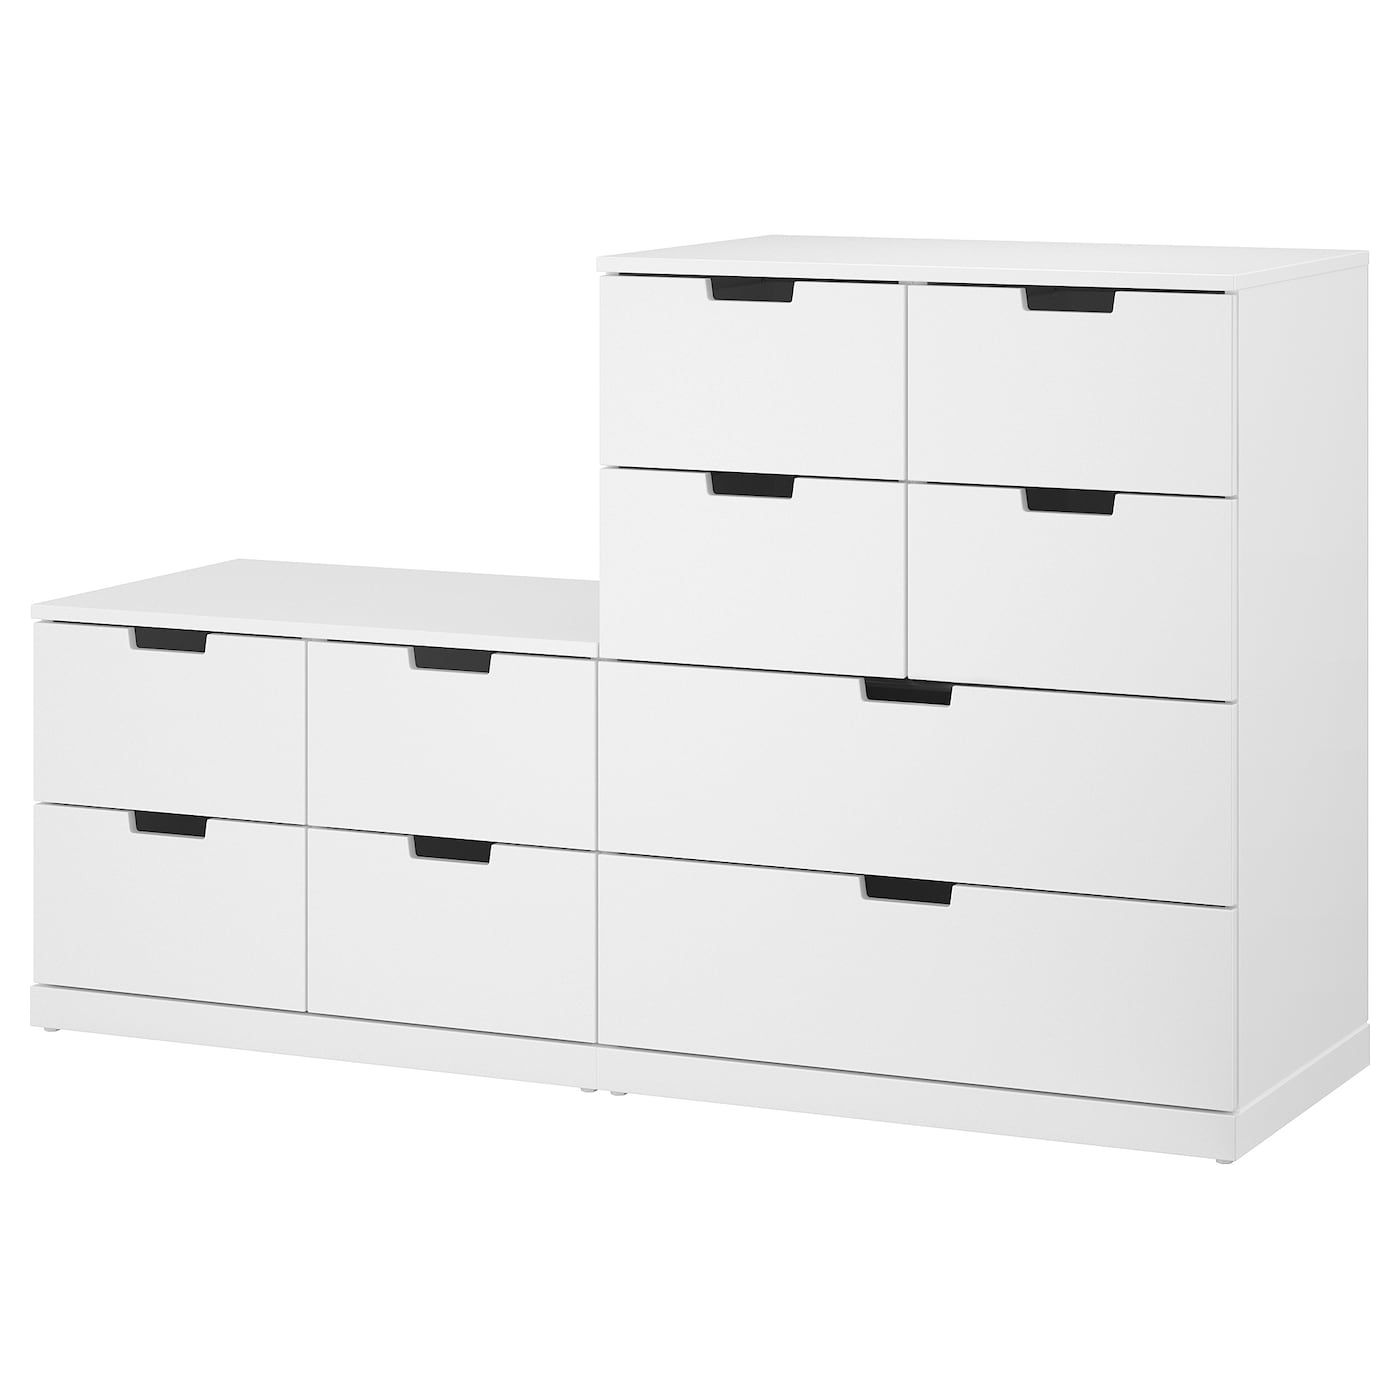 Ikea Nordli Kommode